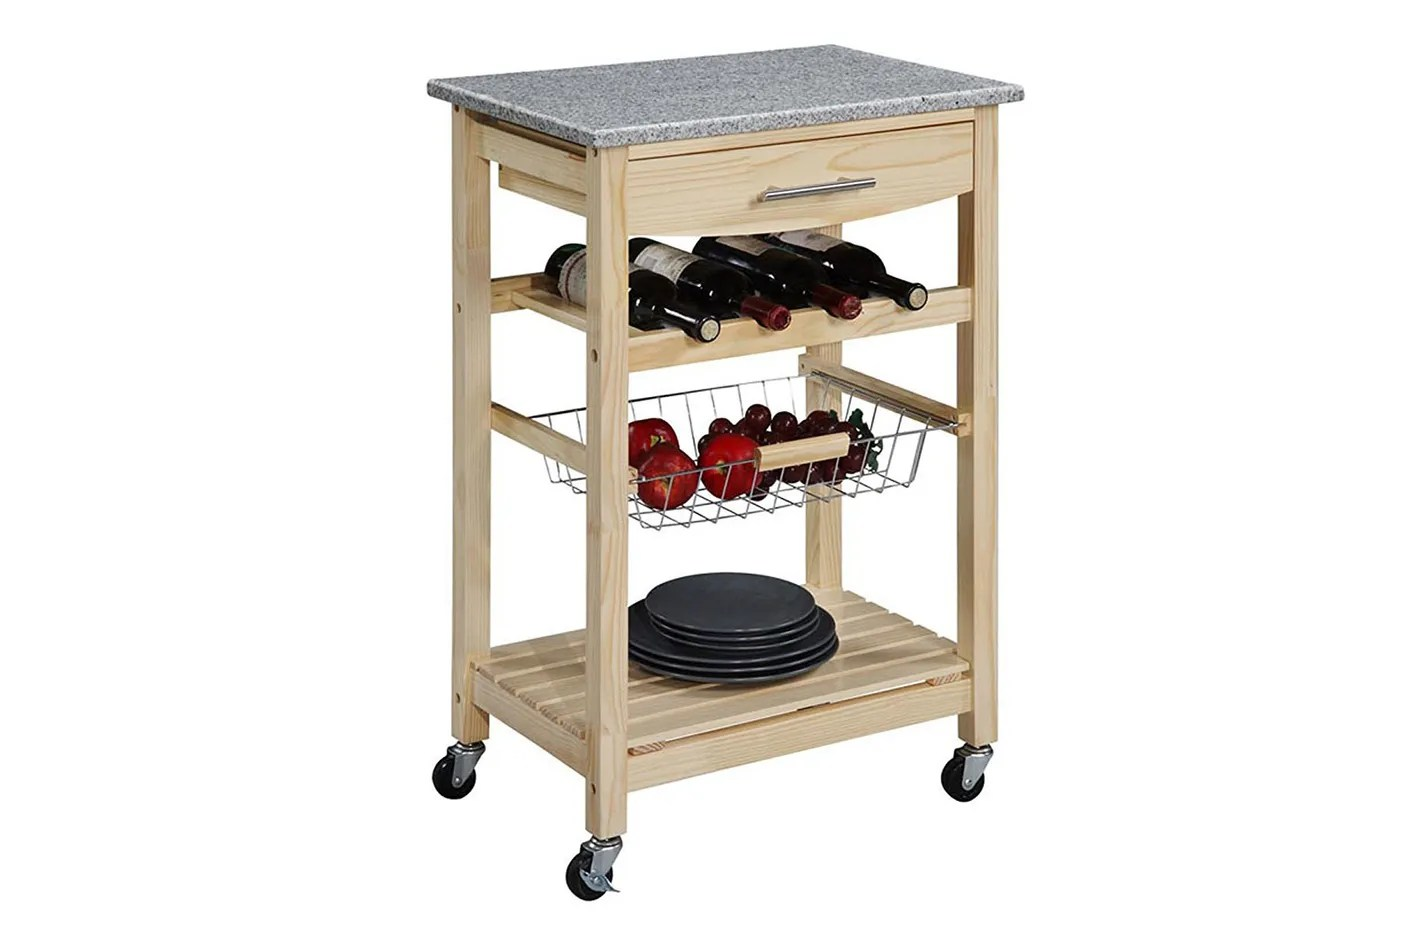 amazon kitchen cart memory foam mats the 14 best butcher block islands and carts  2018